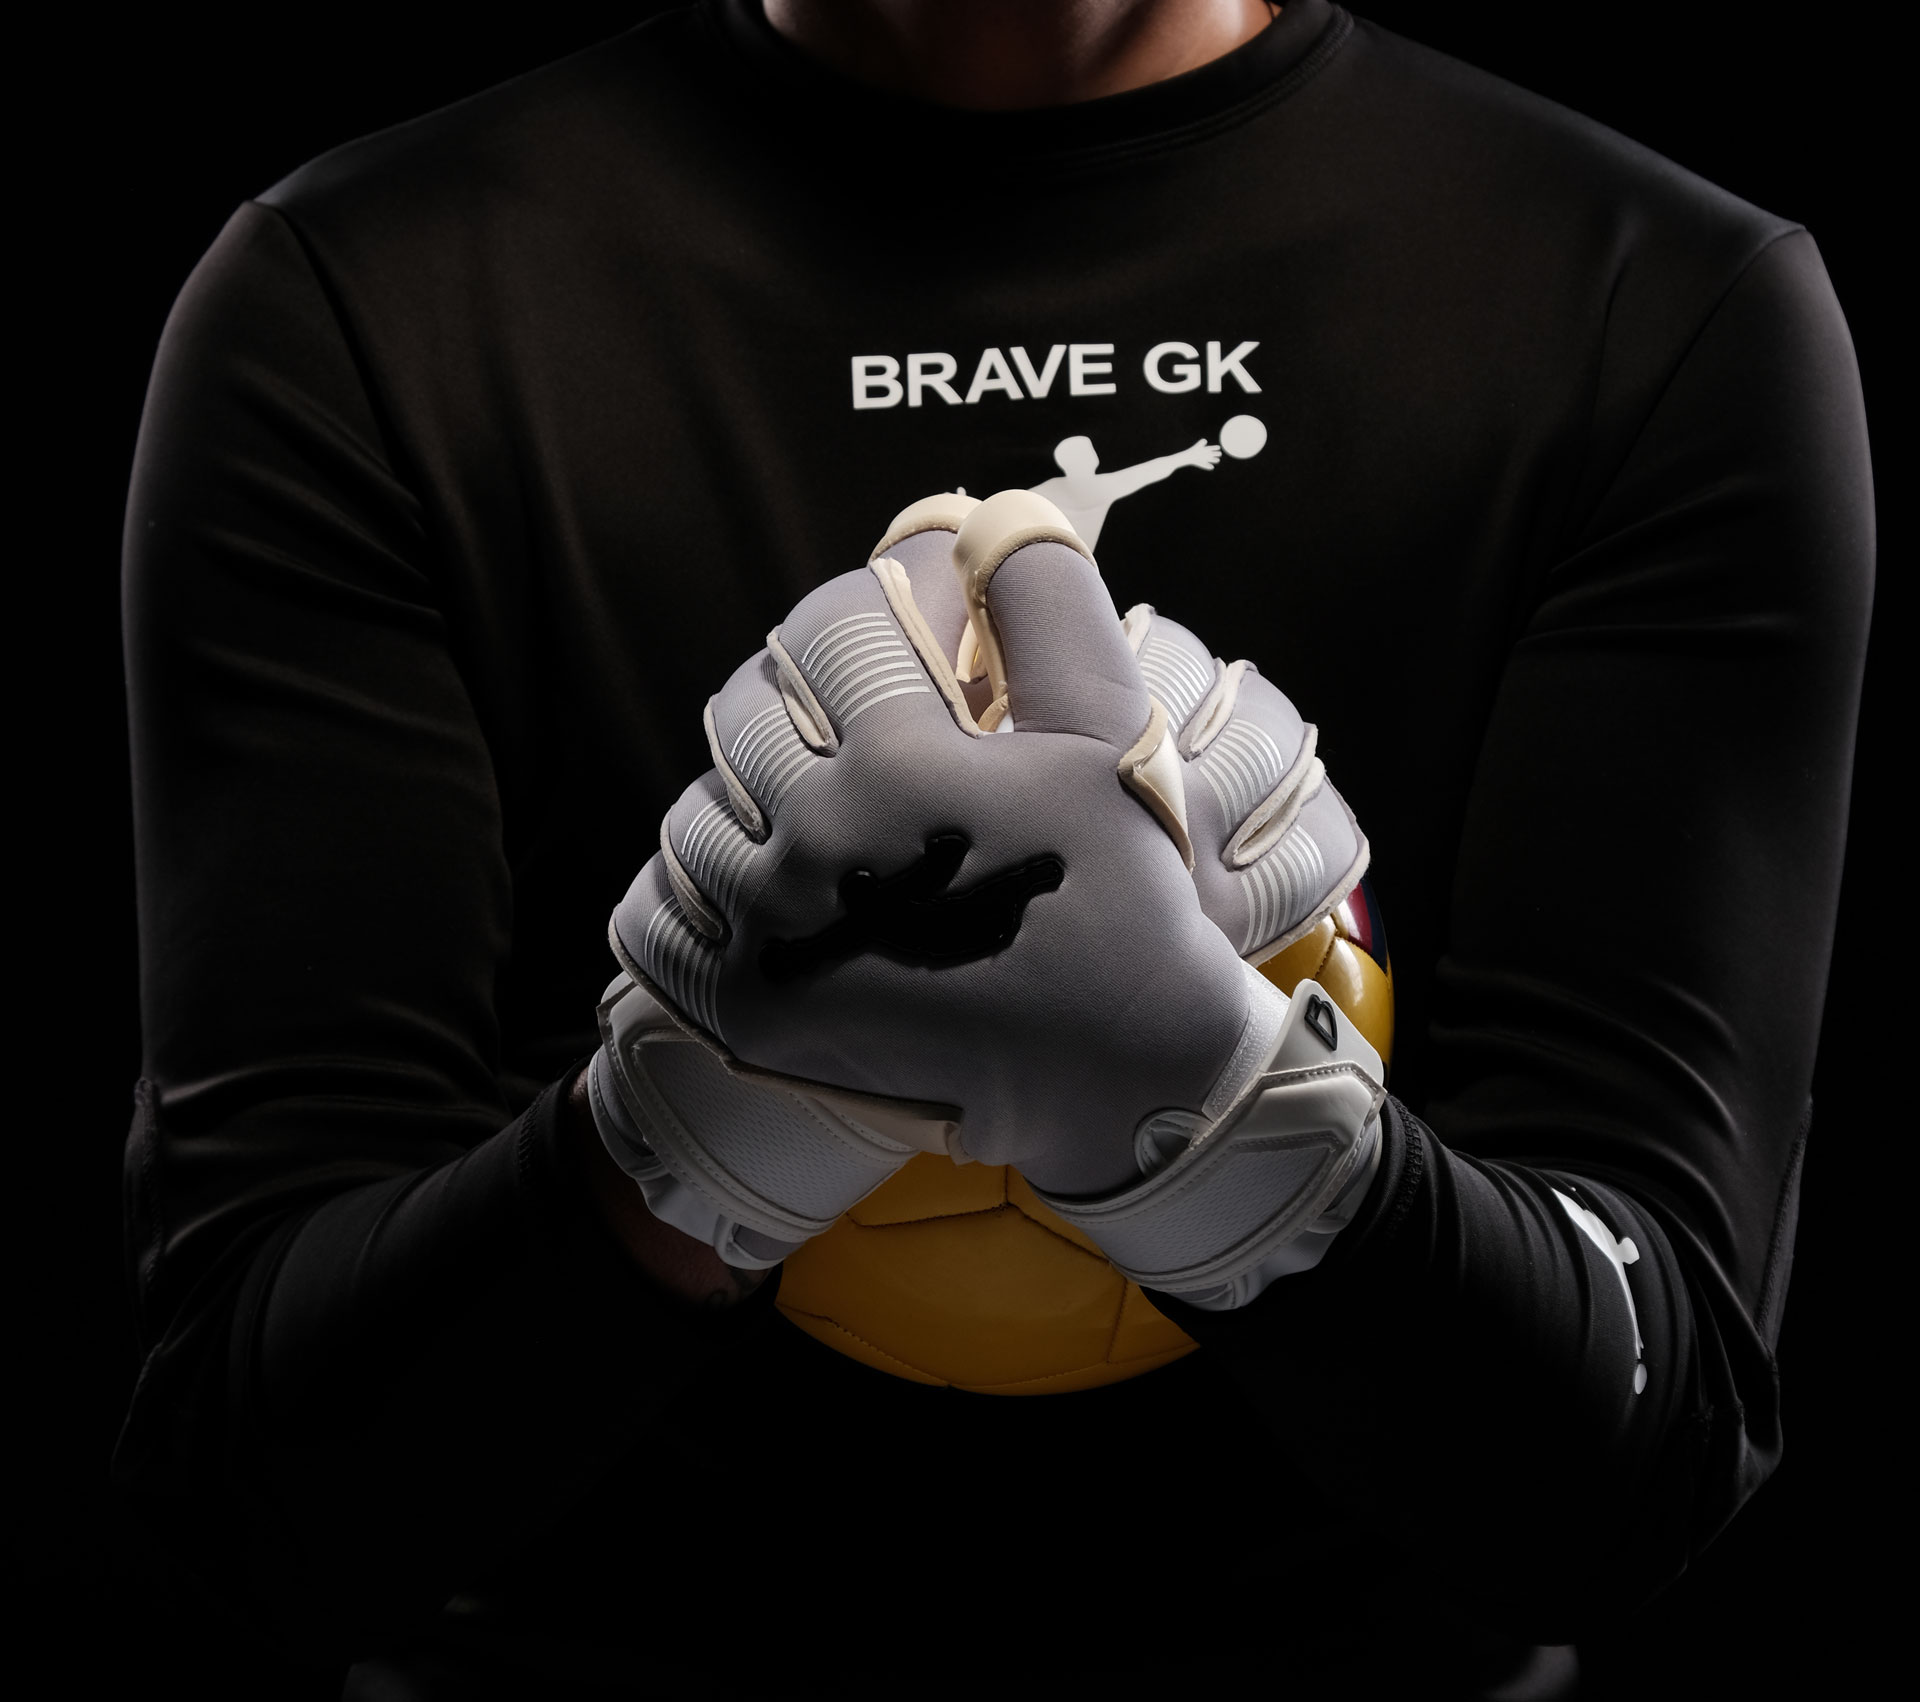 Goalkeeper thermal underwear Brave GK-official online store Brave GK